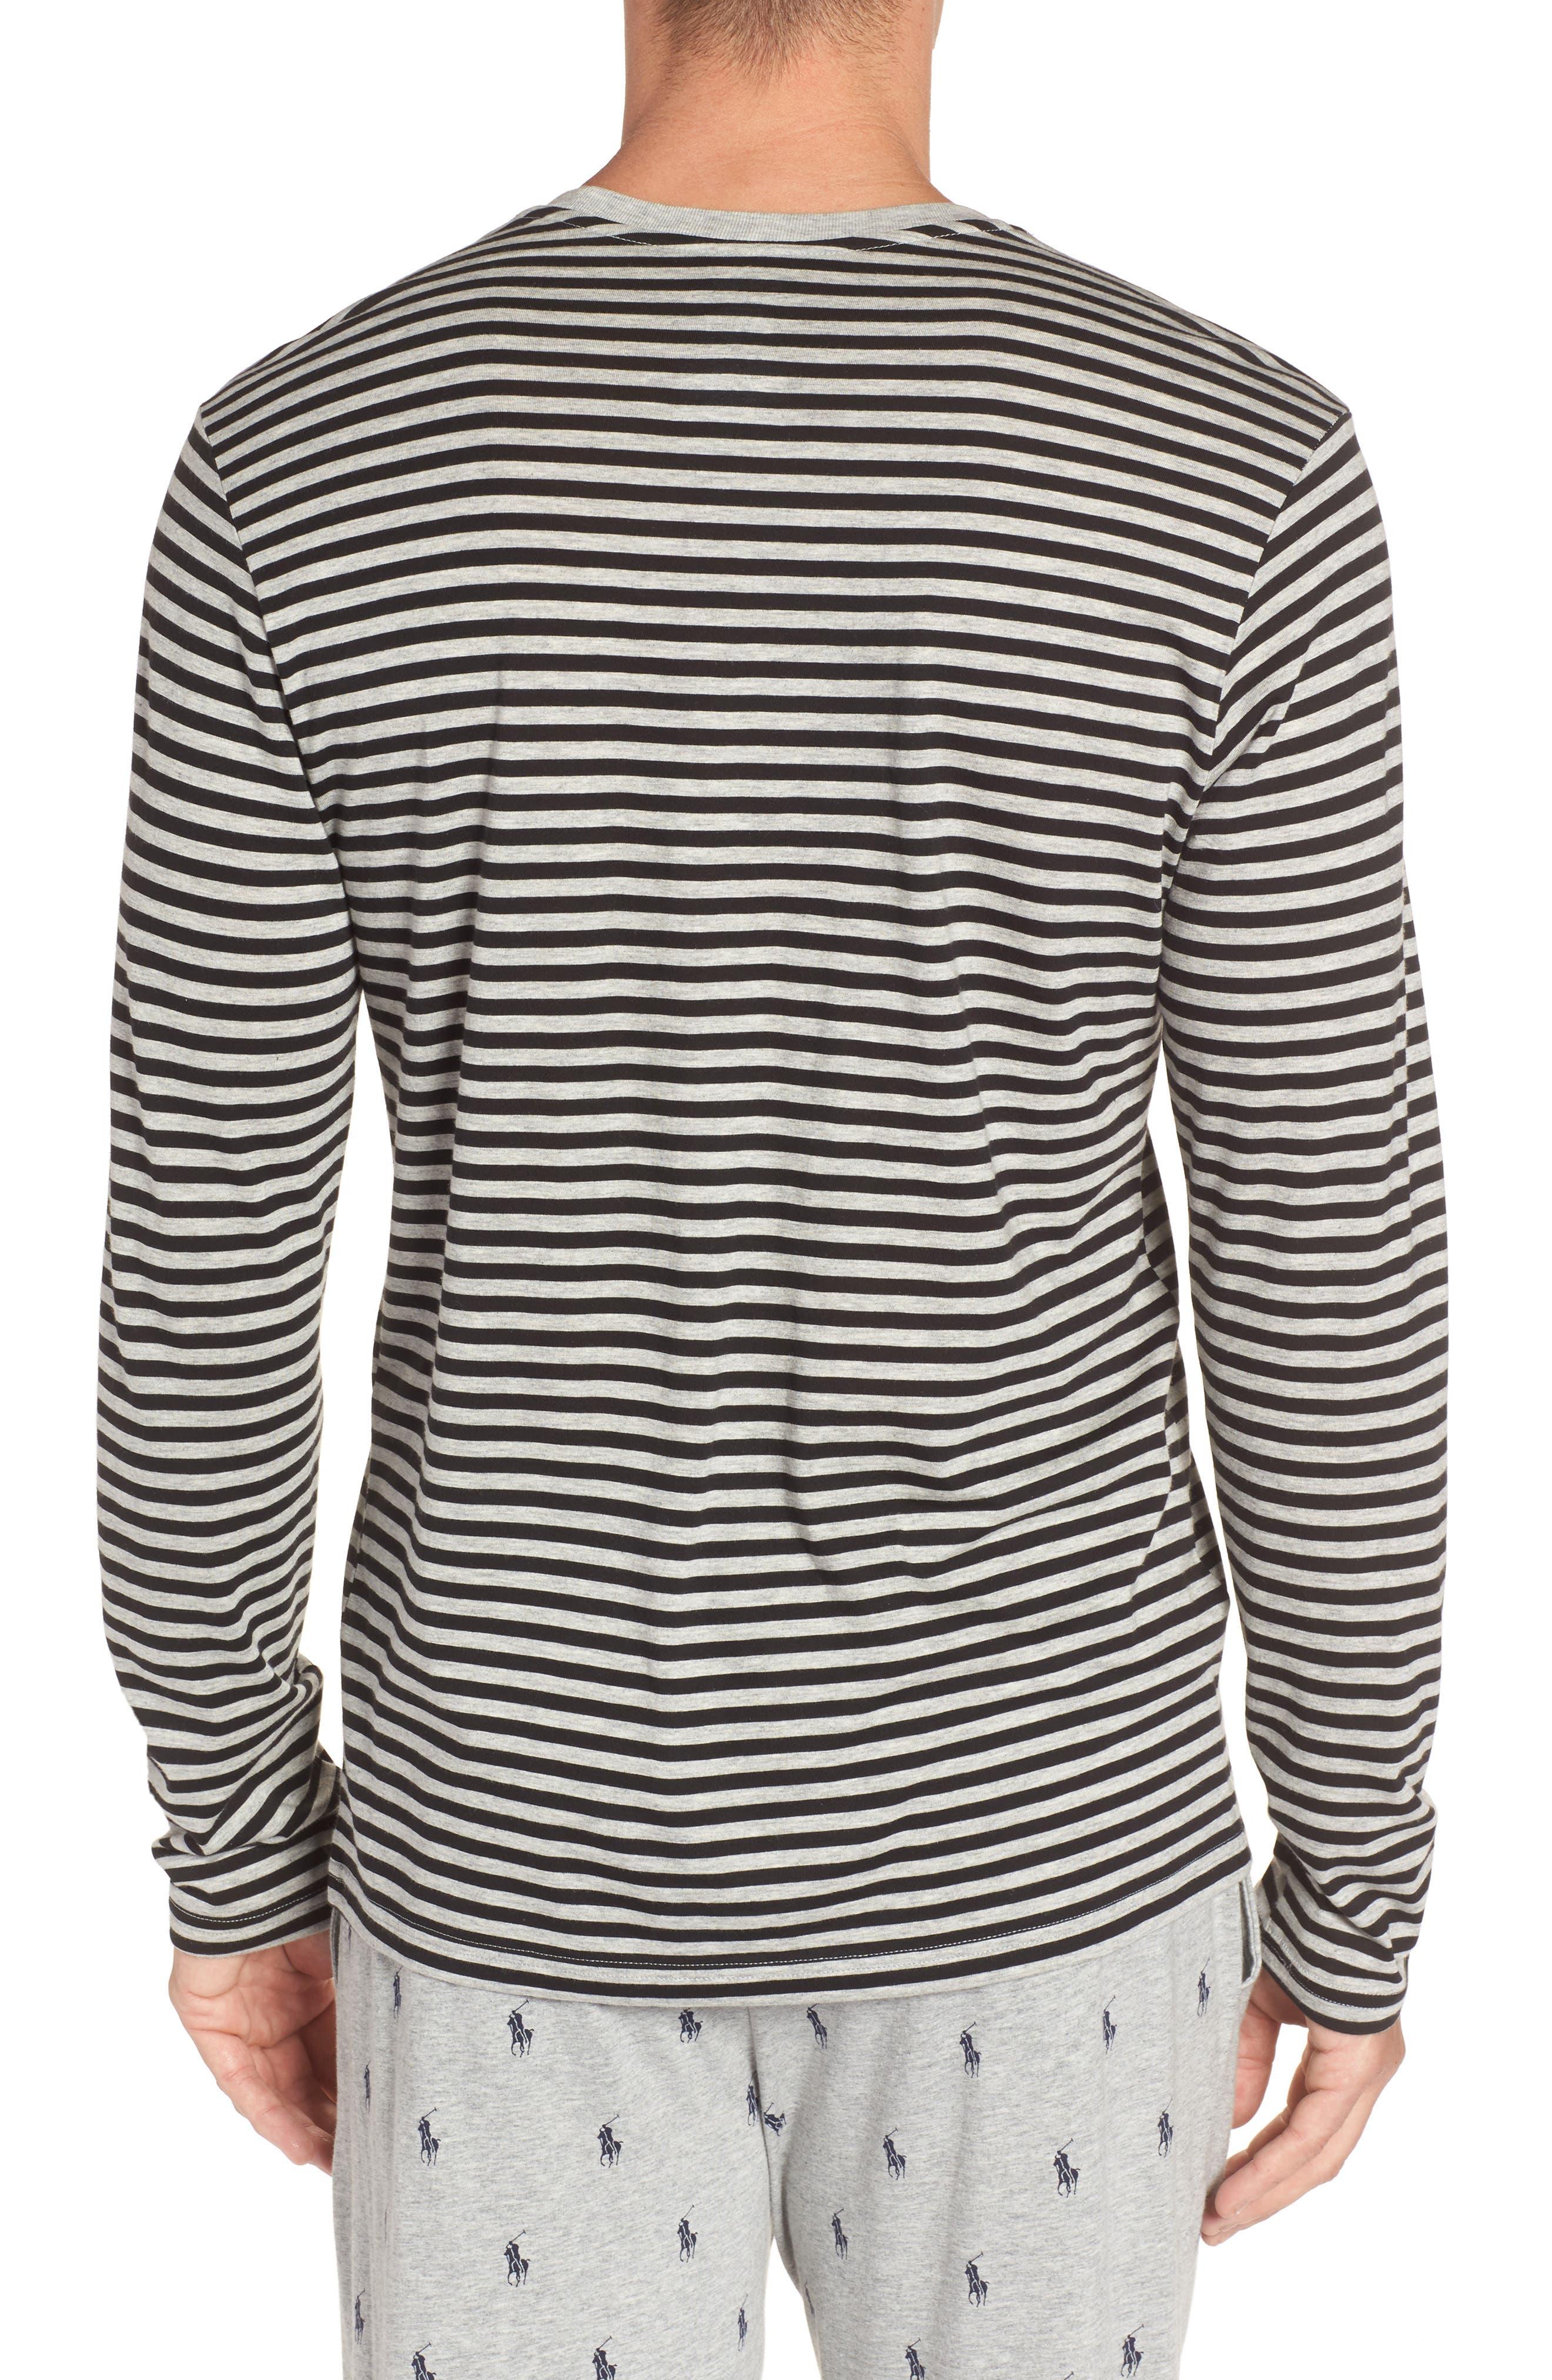 Alternate Image 2  - Polo Ralph Lauren Supreme Comfort Cotton & Modal T-Shirt